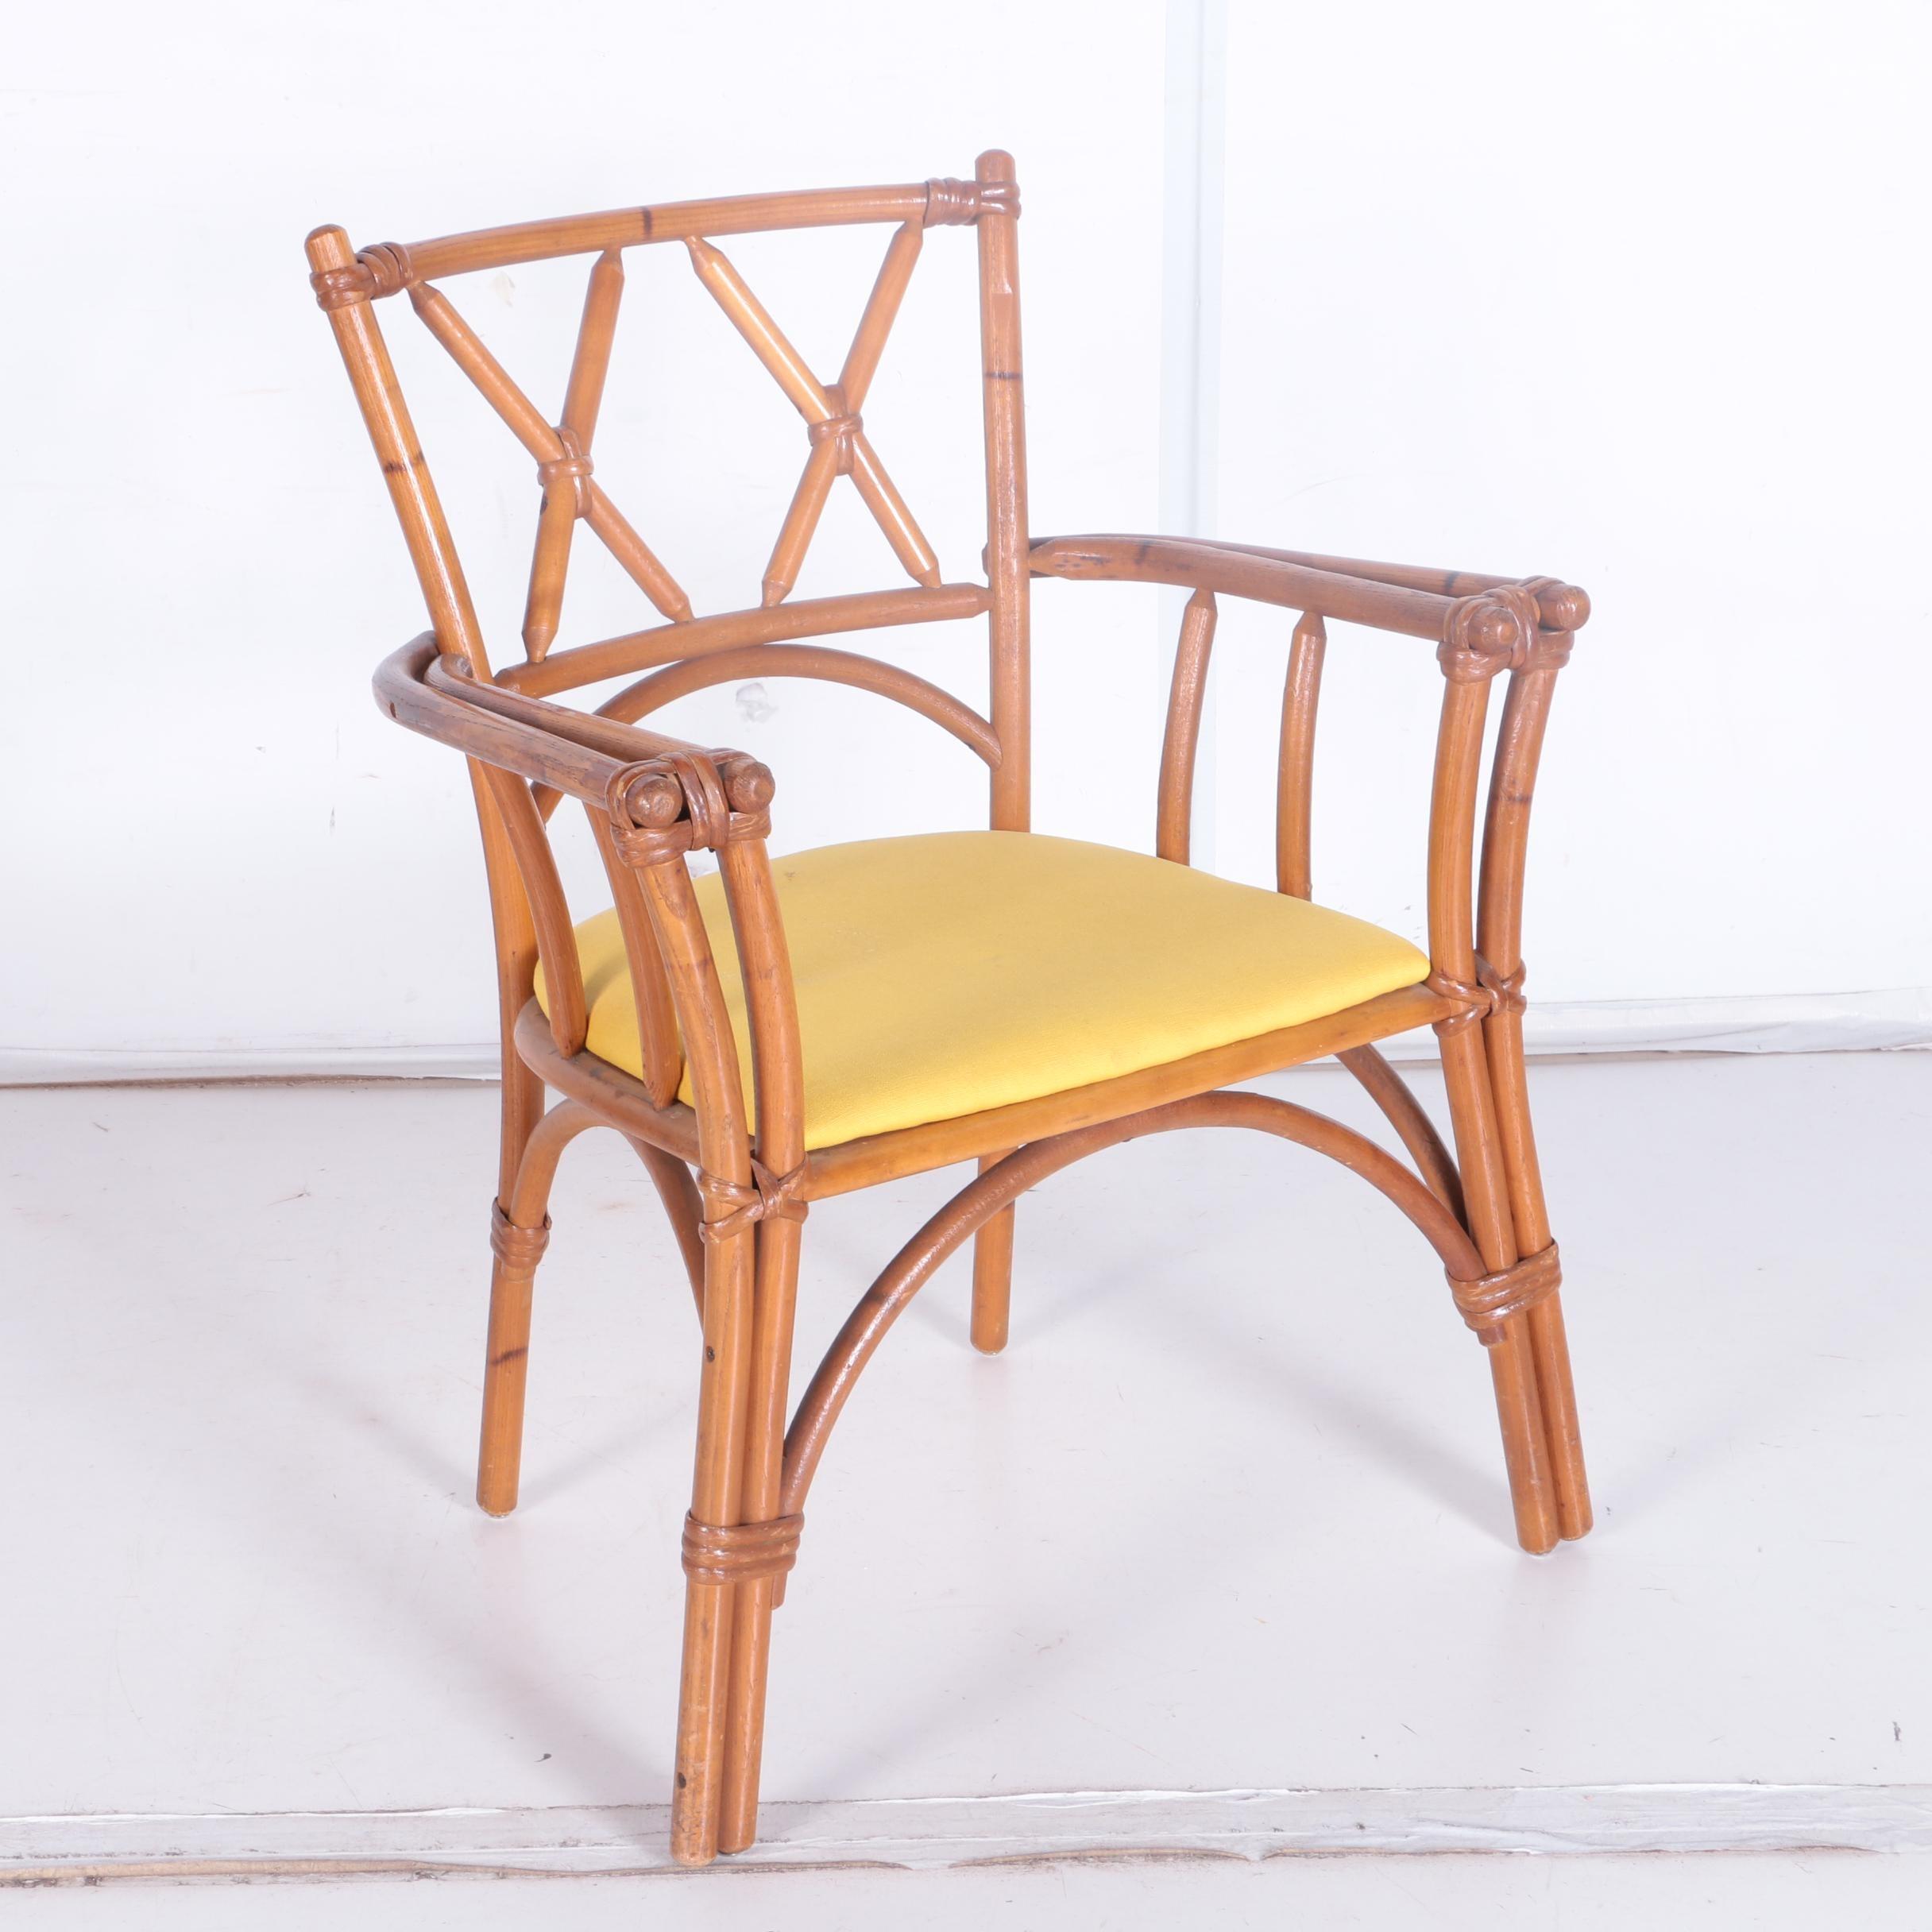 Vintage Rattan Style Arm Chair by Heywood-Wakefield